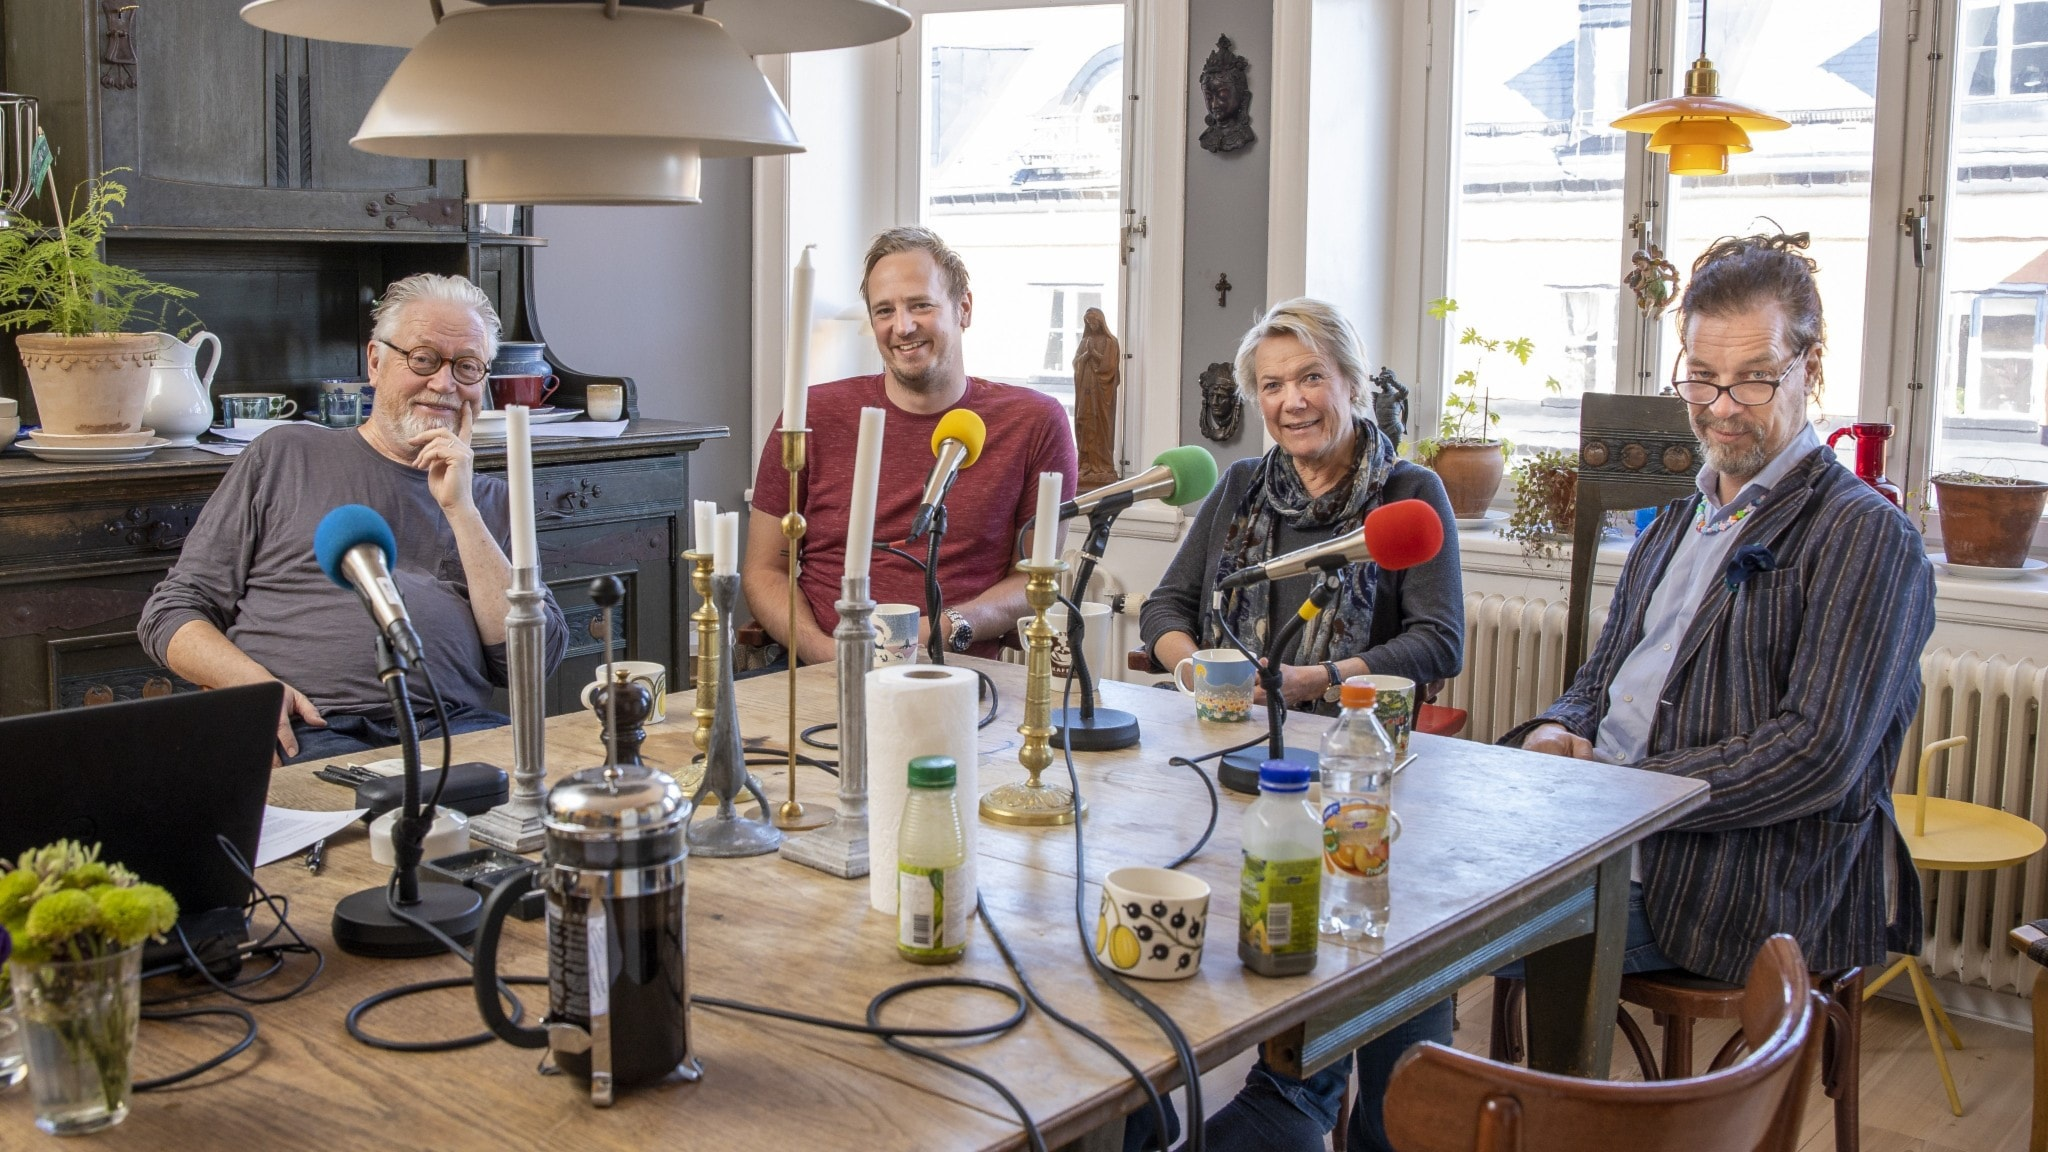 Olle Carlssson präst, Marcus Bremdahl kökschef, Agneta Lagercrantz författare journalist, Bob Hansson programledare.